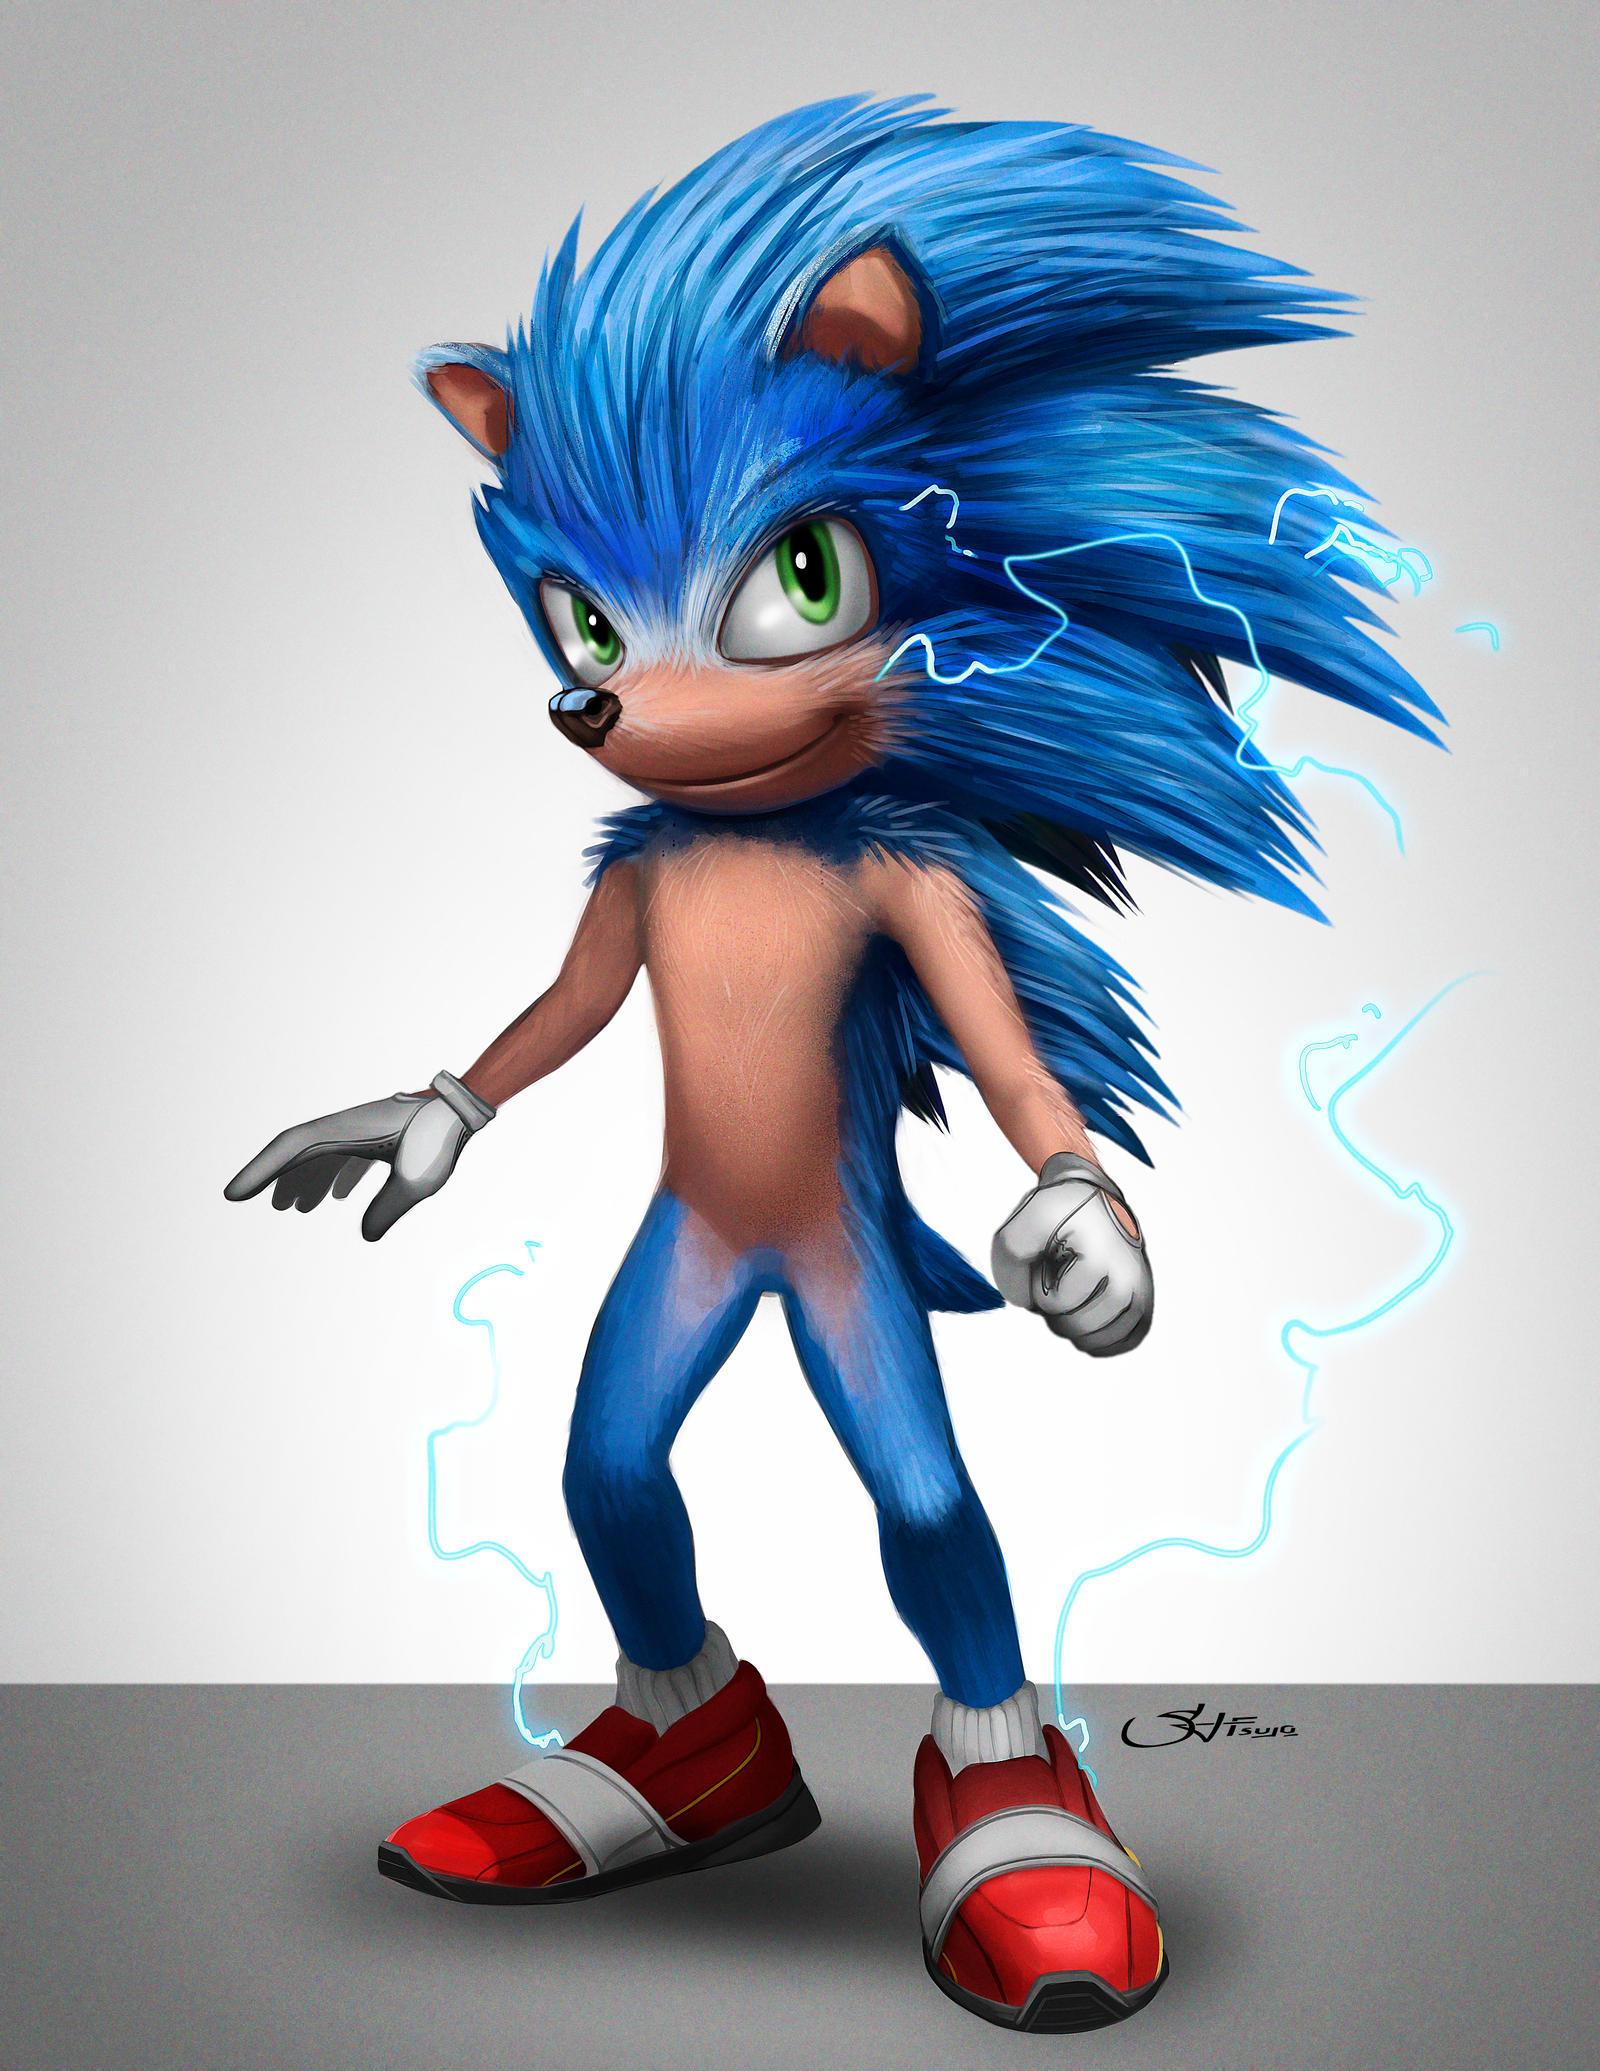 Sonic The Hedgehog Movie Design Fix By Cheetor182 On Deviantart